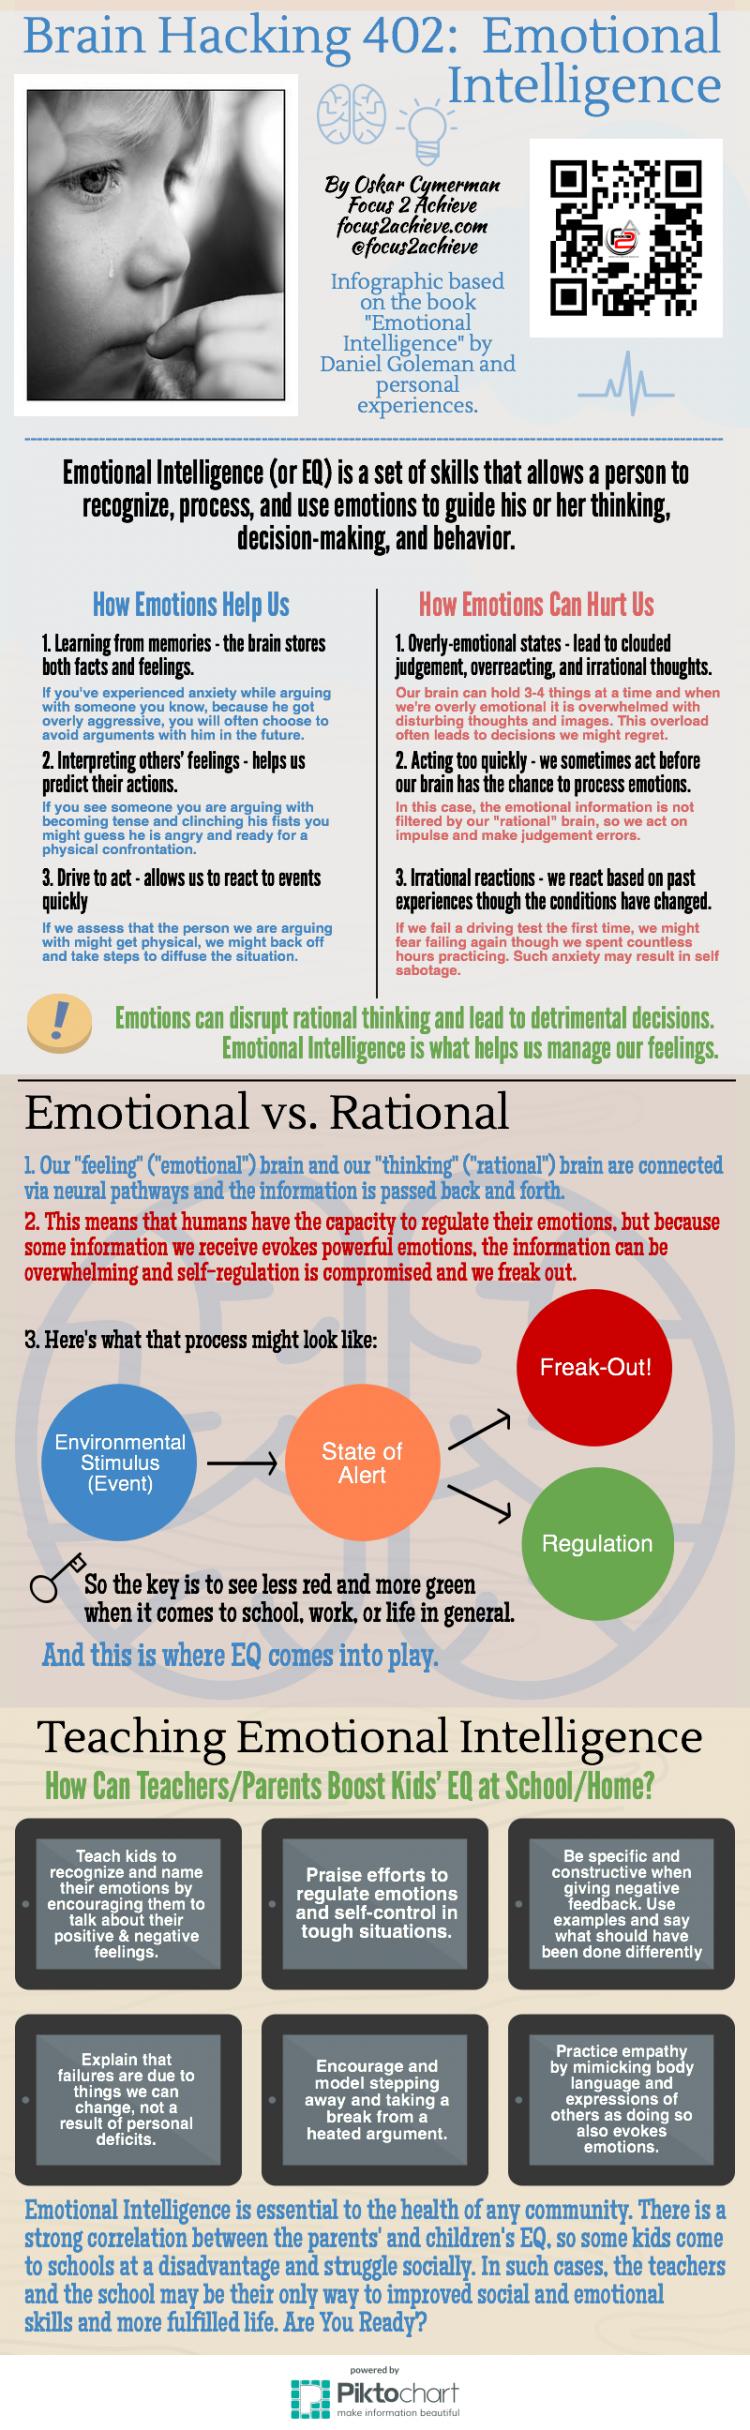 emotional-intelligence-2.png